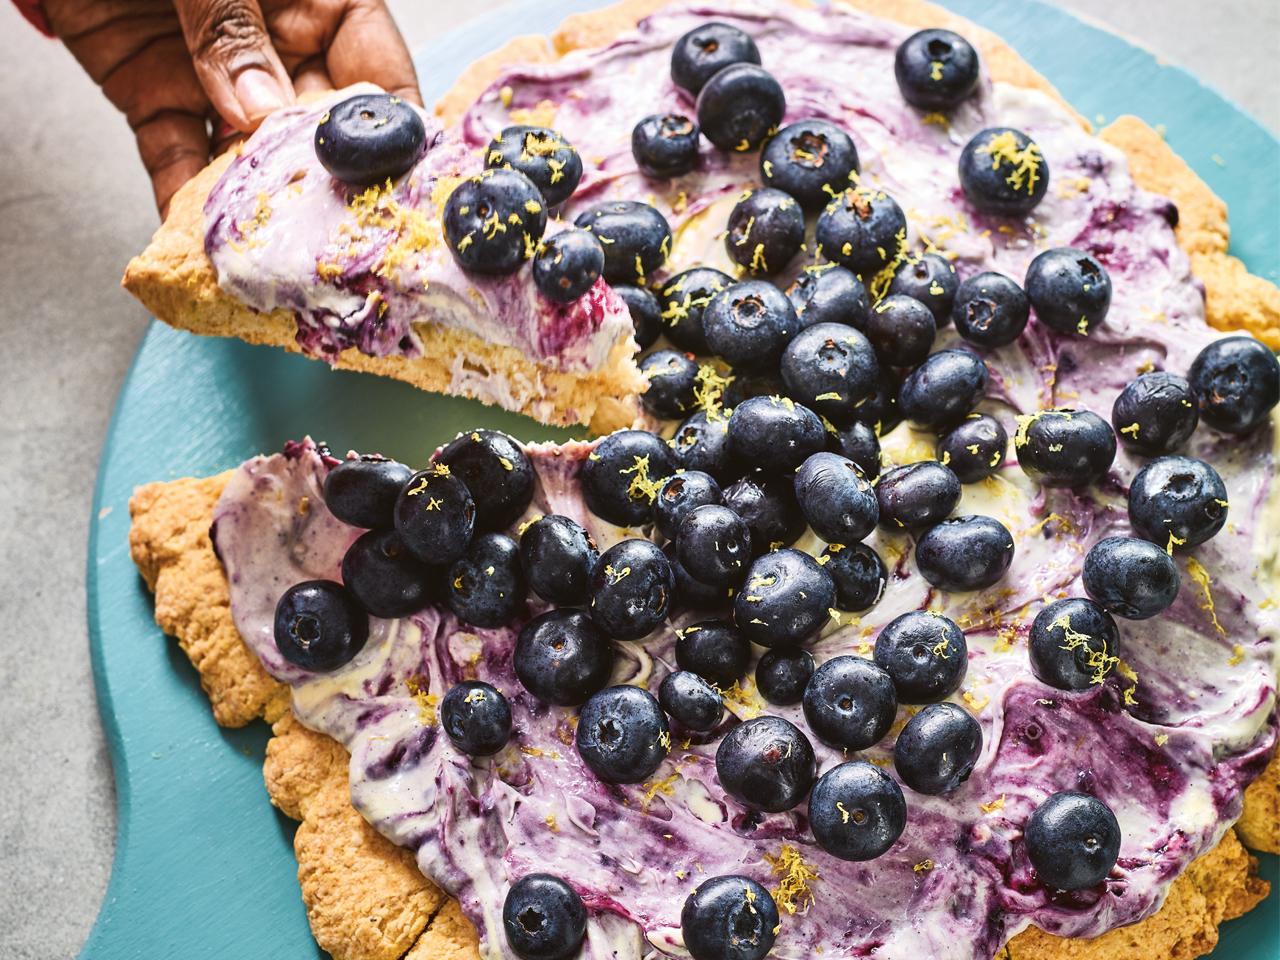 Nadiya Hussain's Blueberry And Lavender Scone Pizza